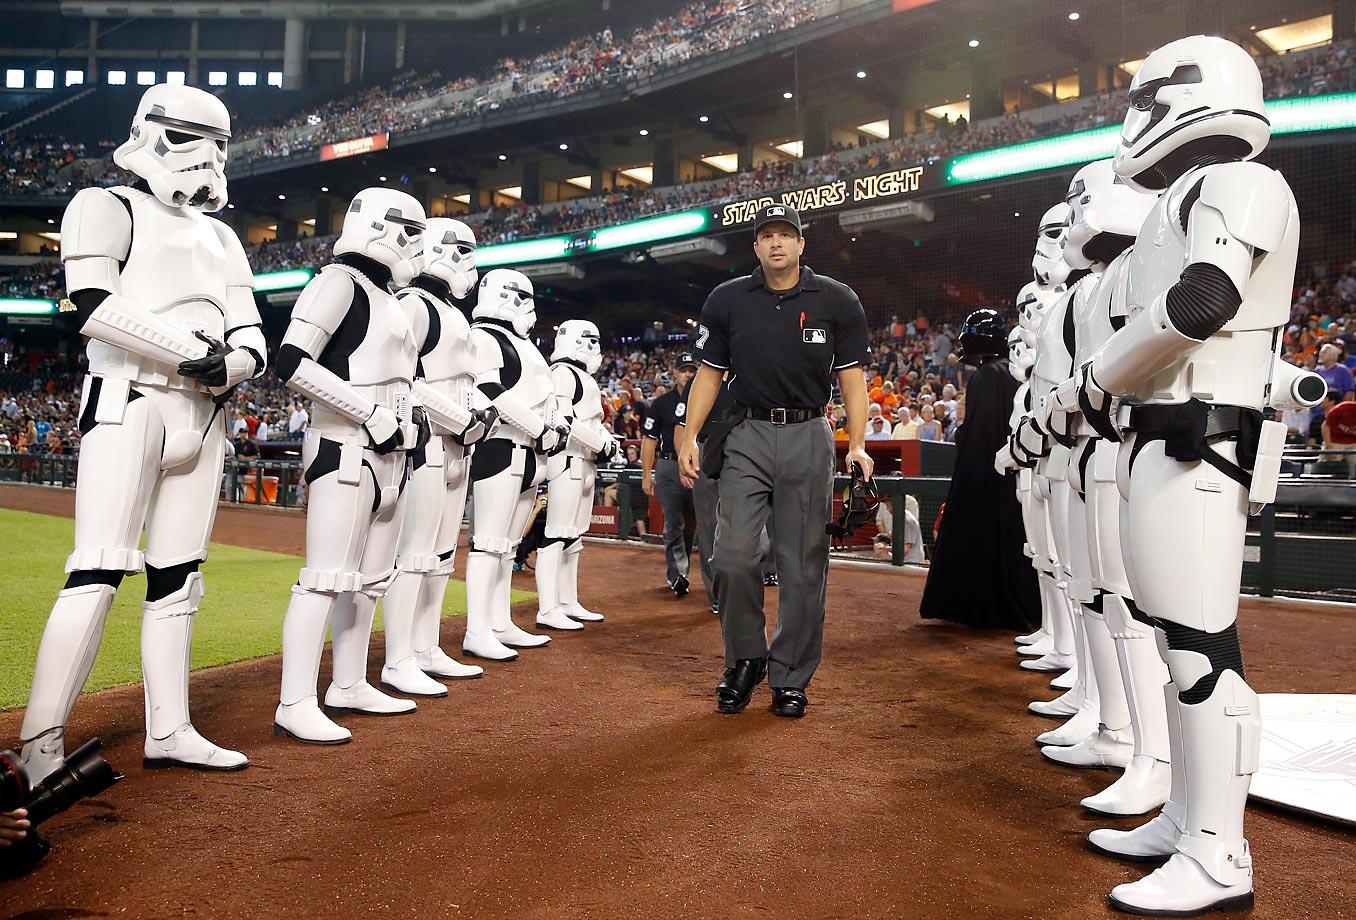 MLB umpire Jim Reynolds walks out to the field before a baseball game between the Arizona Diamondbacks and the San Francisco Giants on Star Wars night.